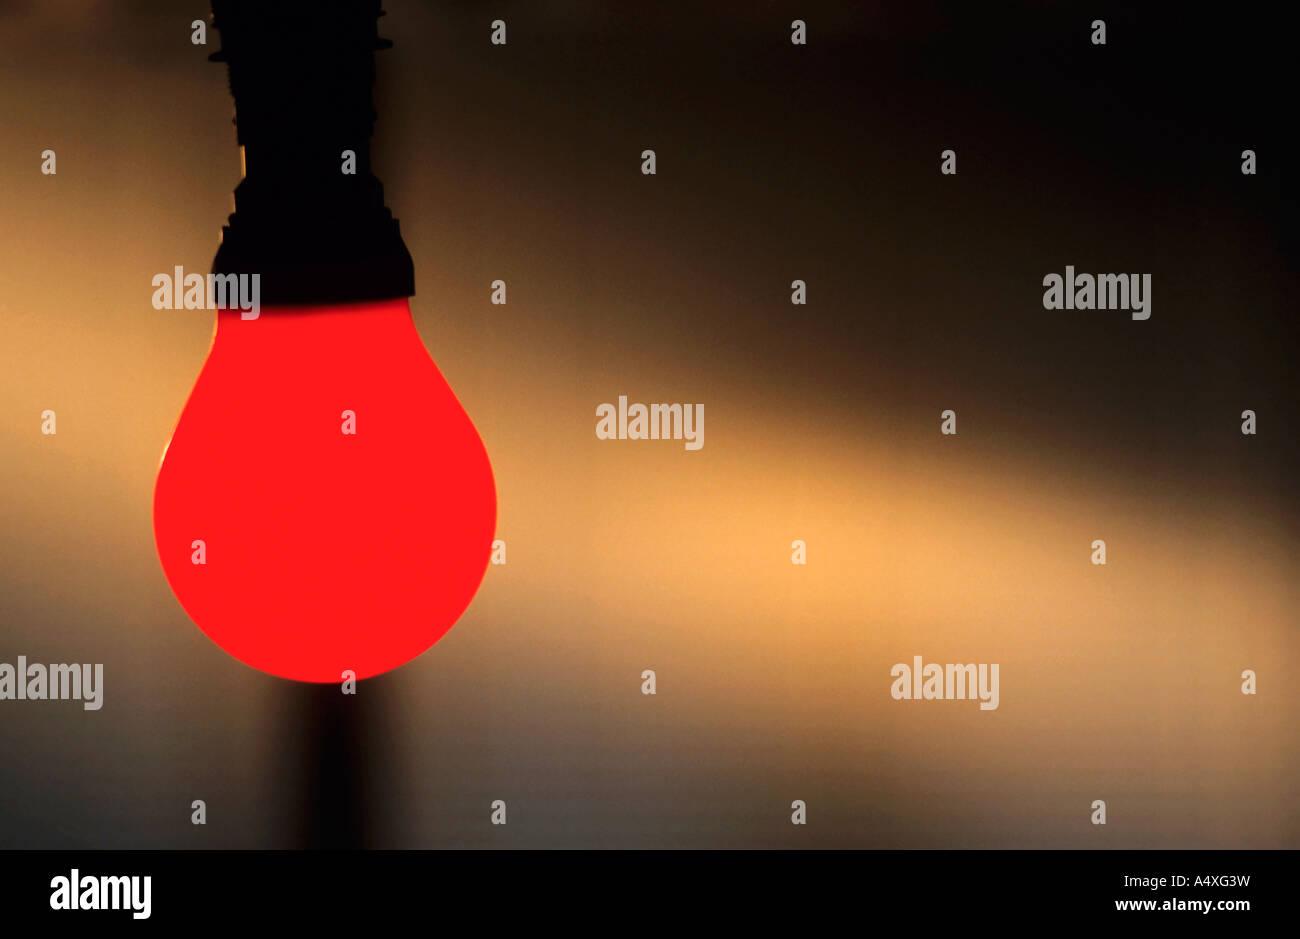 Beleuchtete rote Glühbirne. Stockbild